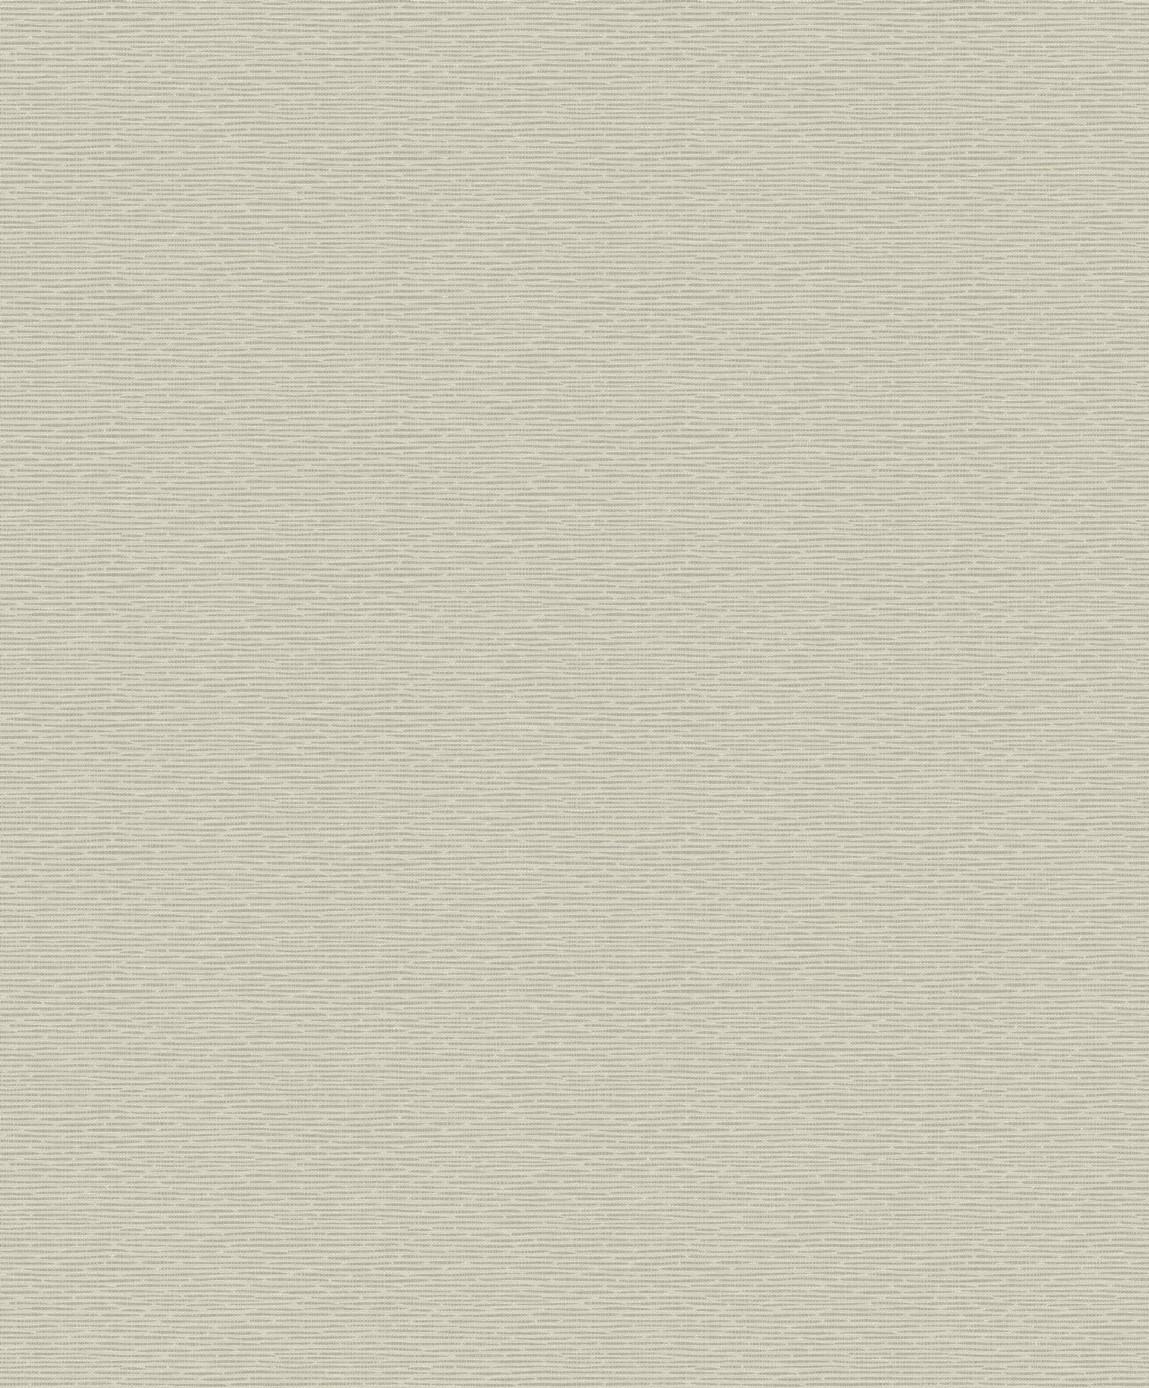 Tapety na zeď Vavex A10302 | 0,53 x 10,05 m (Vliesová tapeta - zelená)